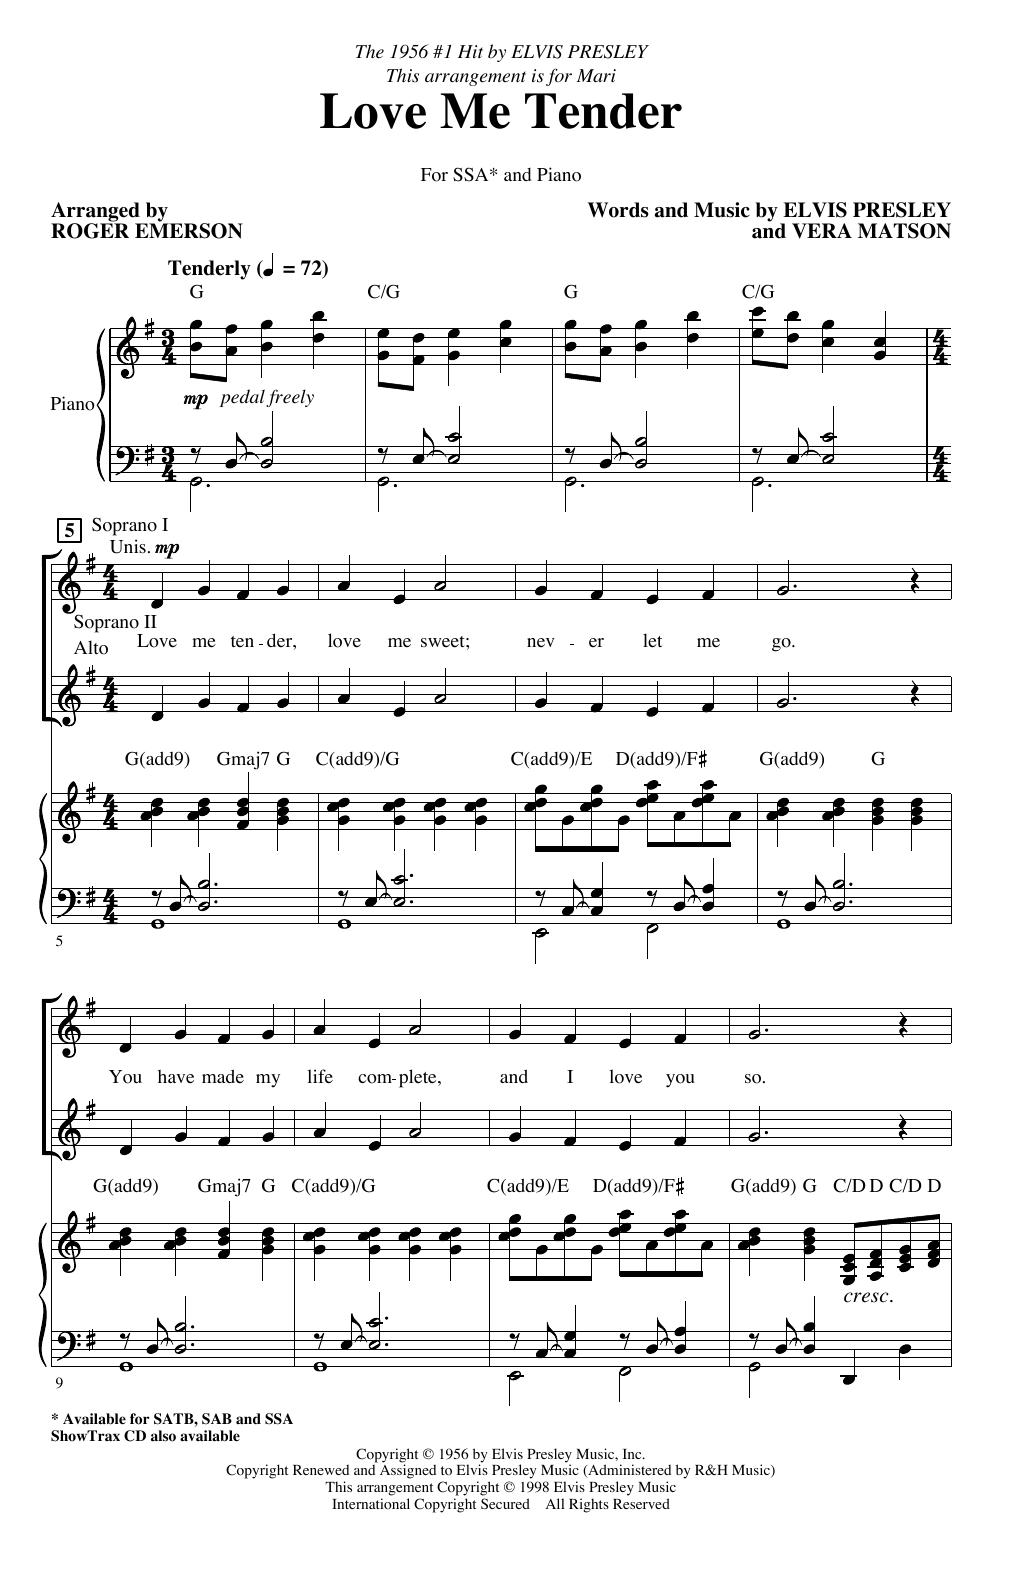 Love Me Tender (arr. Roger Emerson) (SSA Choir)